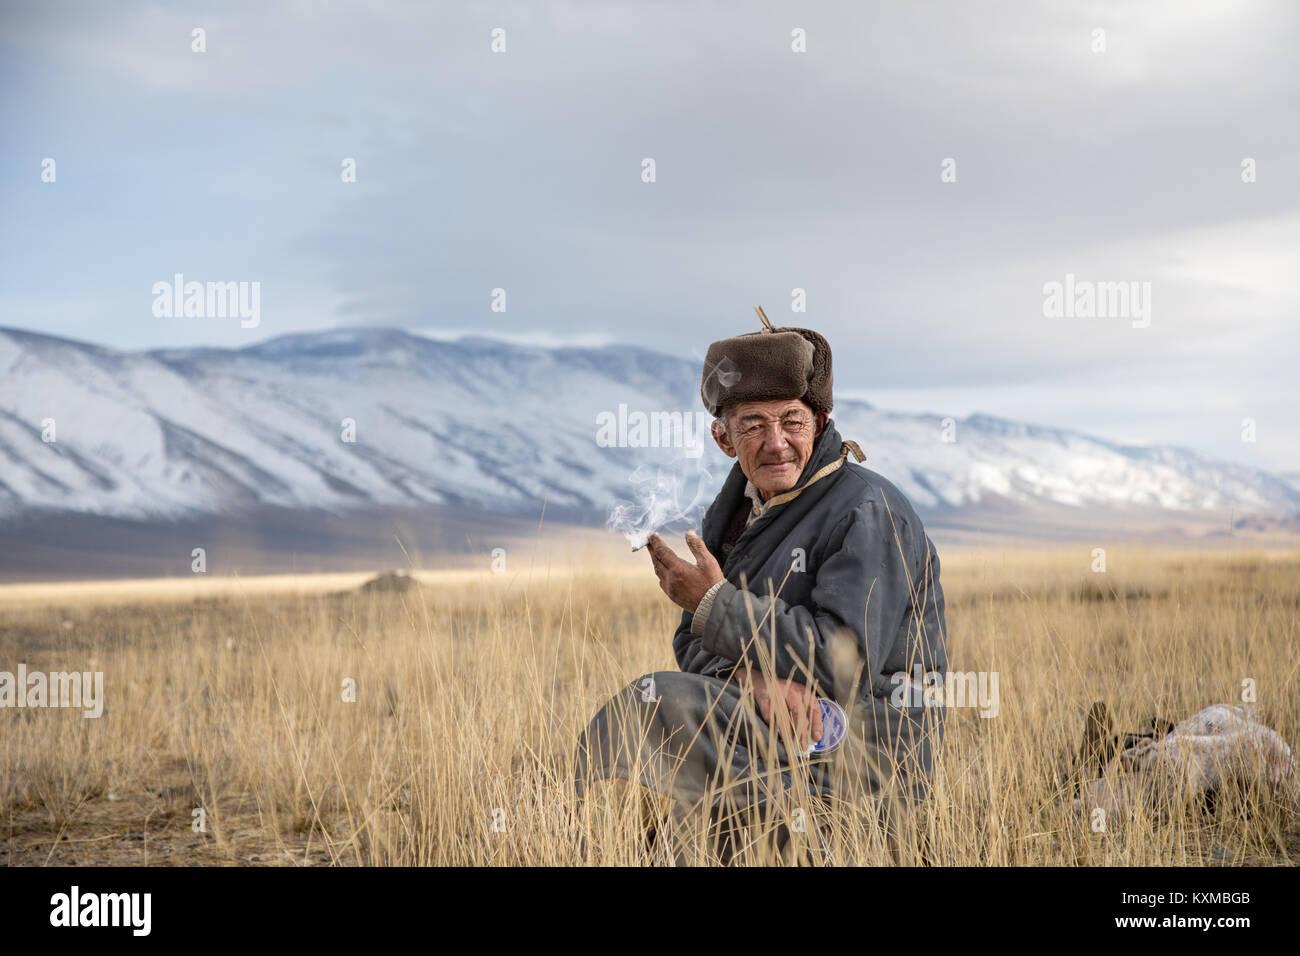 País rural del lado Mongol viejo fumar cigarrillo fur hat Mongolia abuelo Descanso Descanso Imagen De Stock